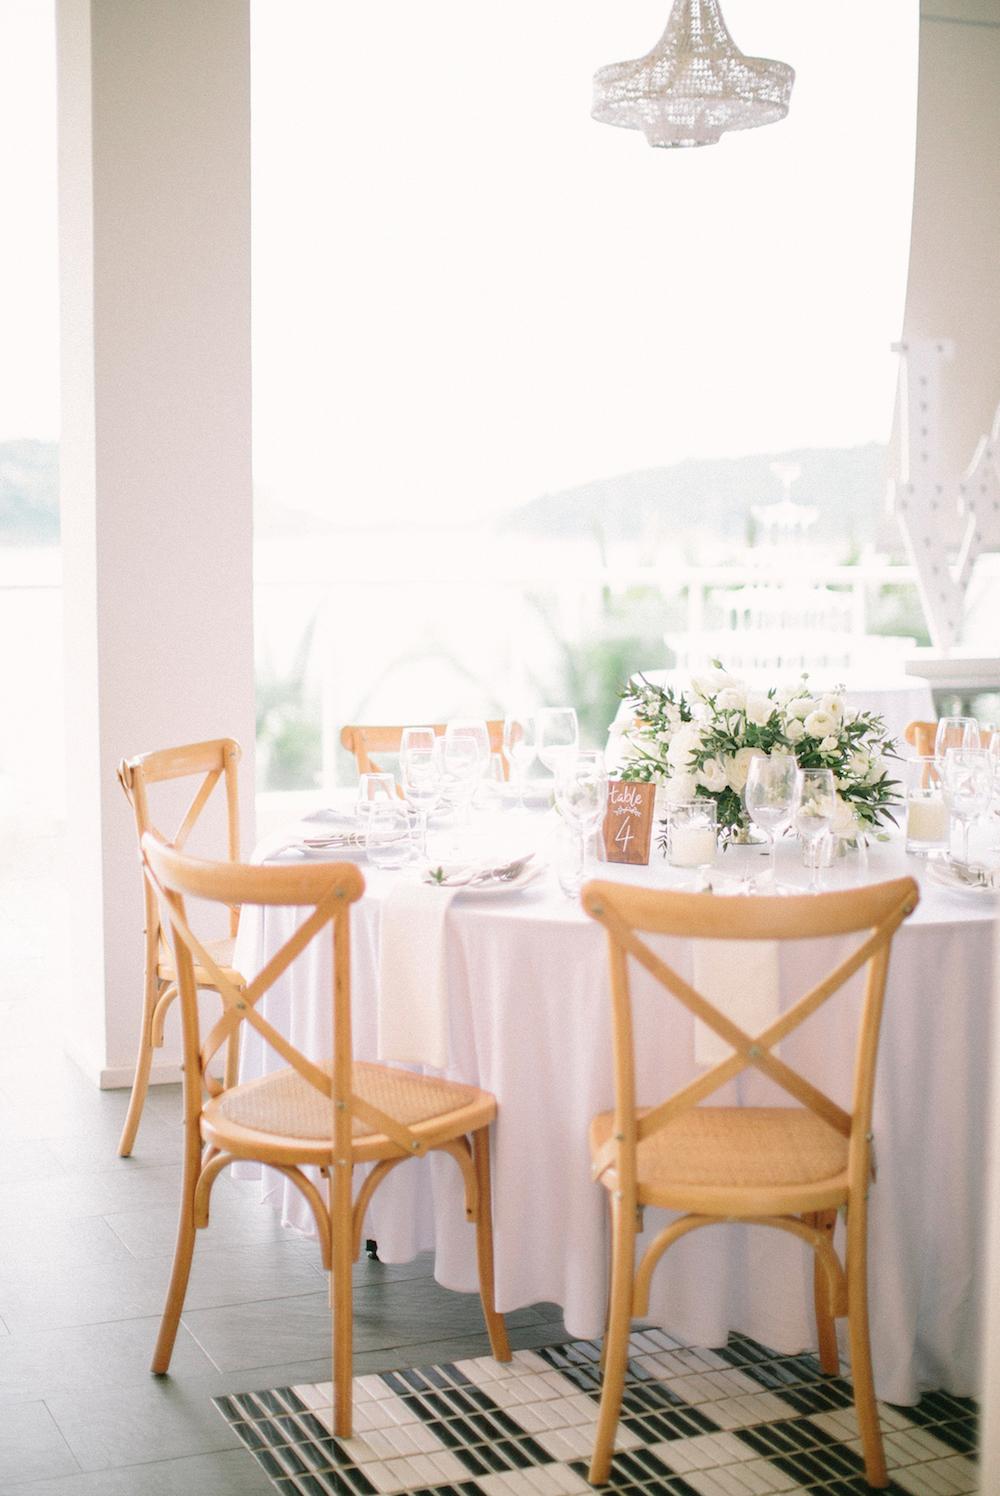 ©-saya-photography-studio-ohlala-wedding-photographer-photographe-mariage-the-naiharn-phuket-115.jpg